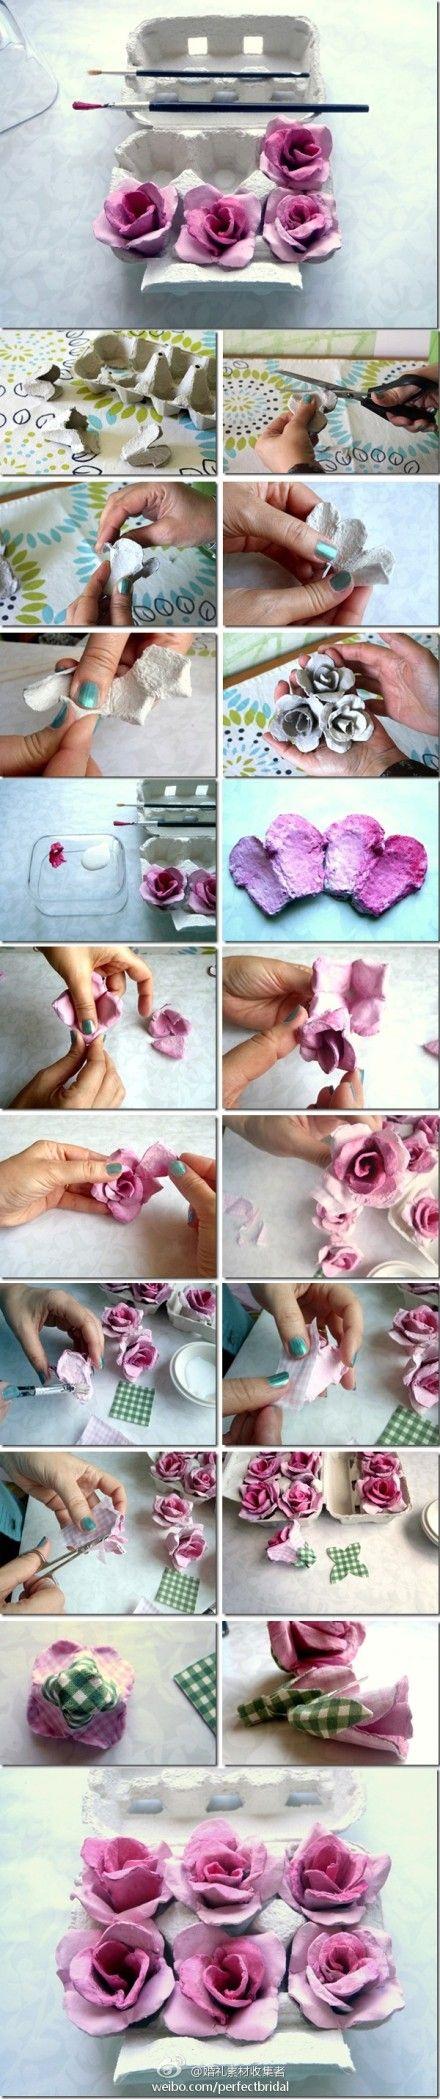 egg box DIY roses